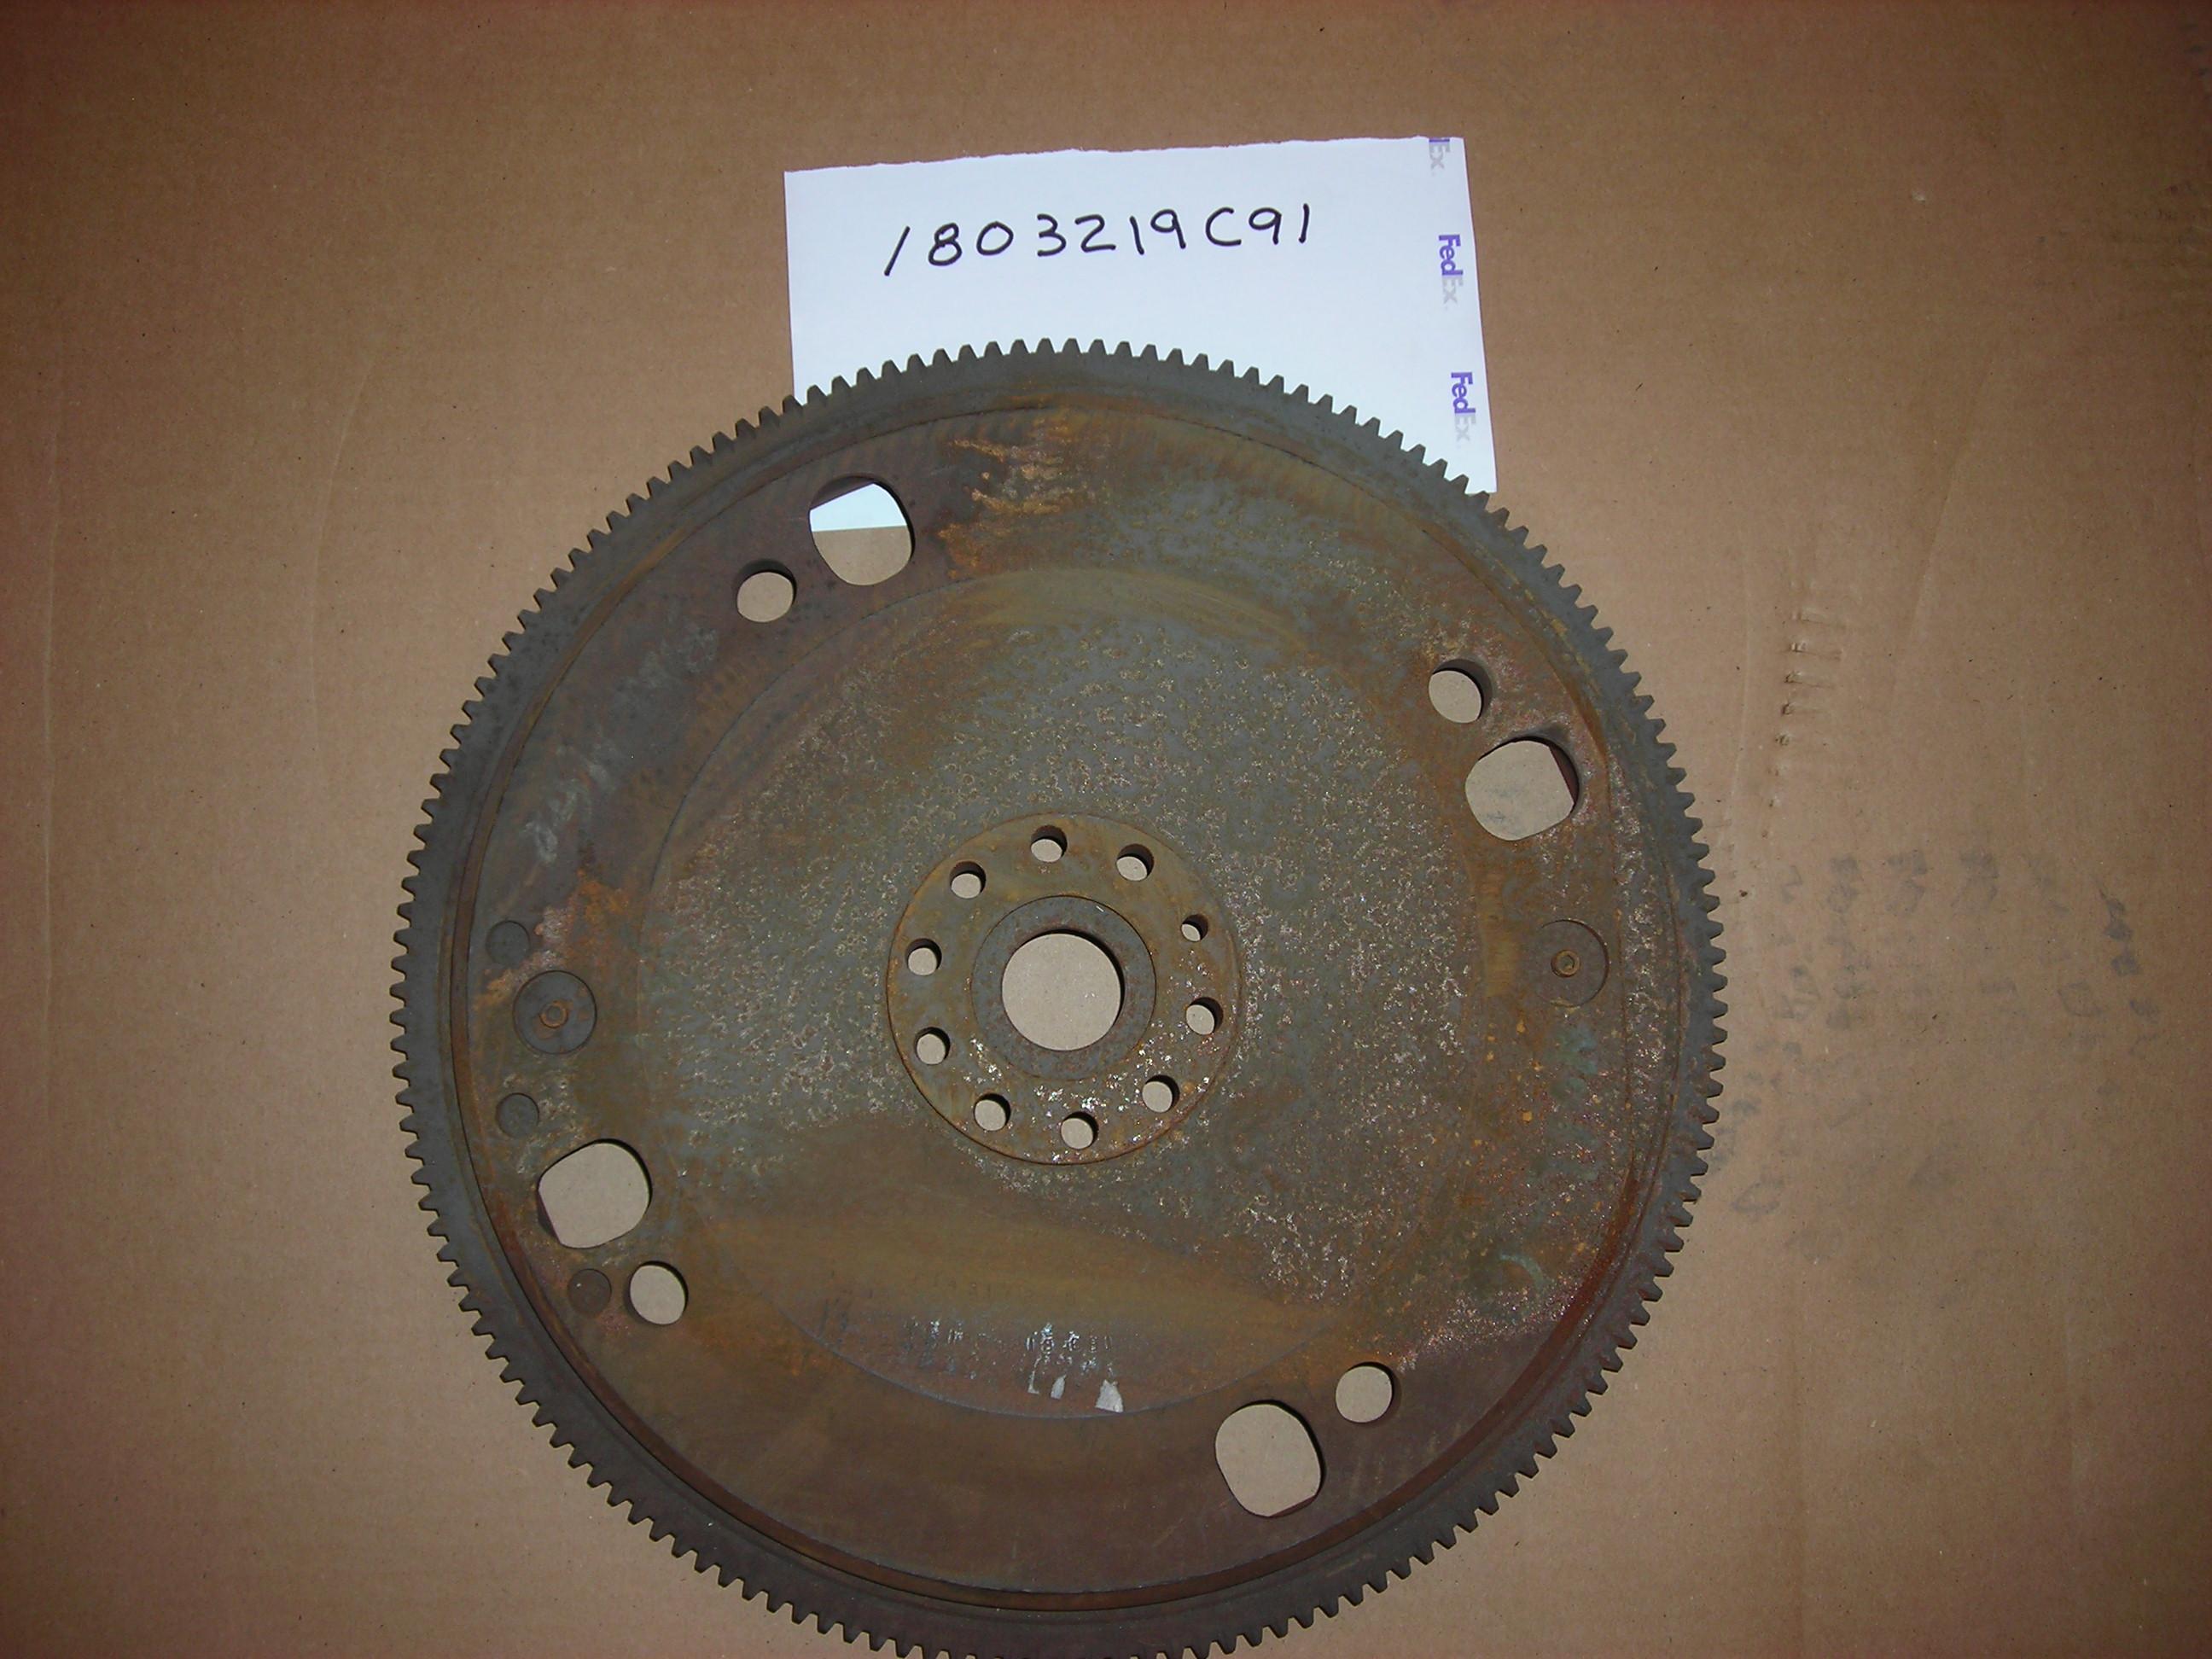 1803219C91 Navistar International Flywheel Front